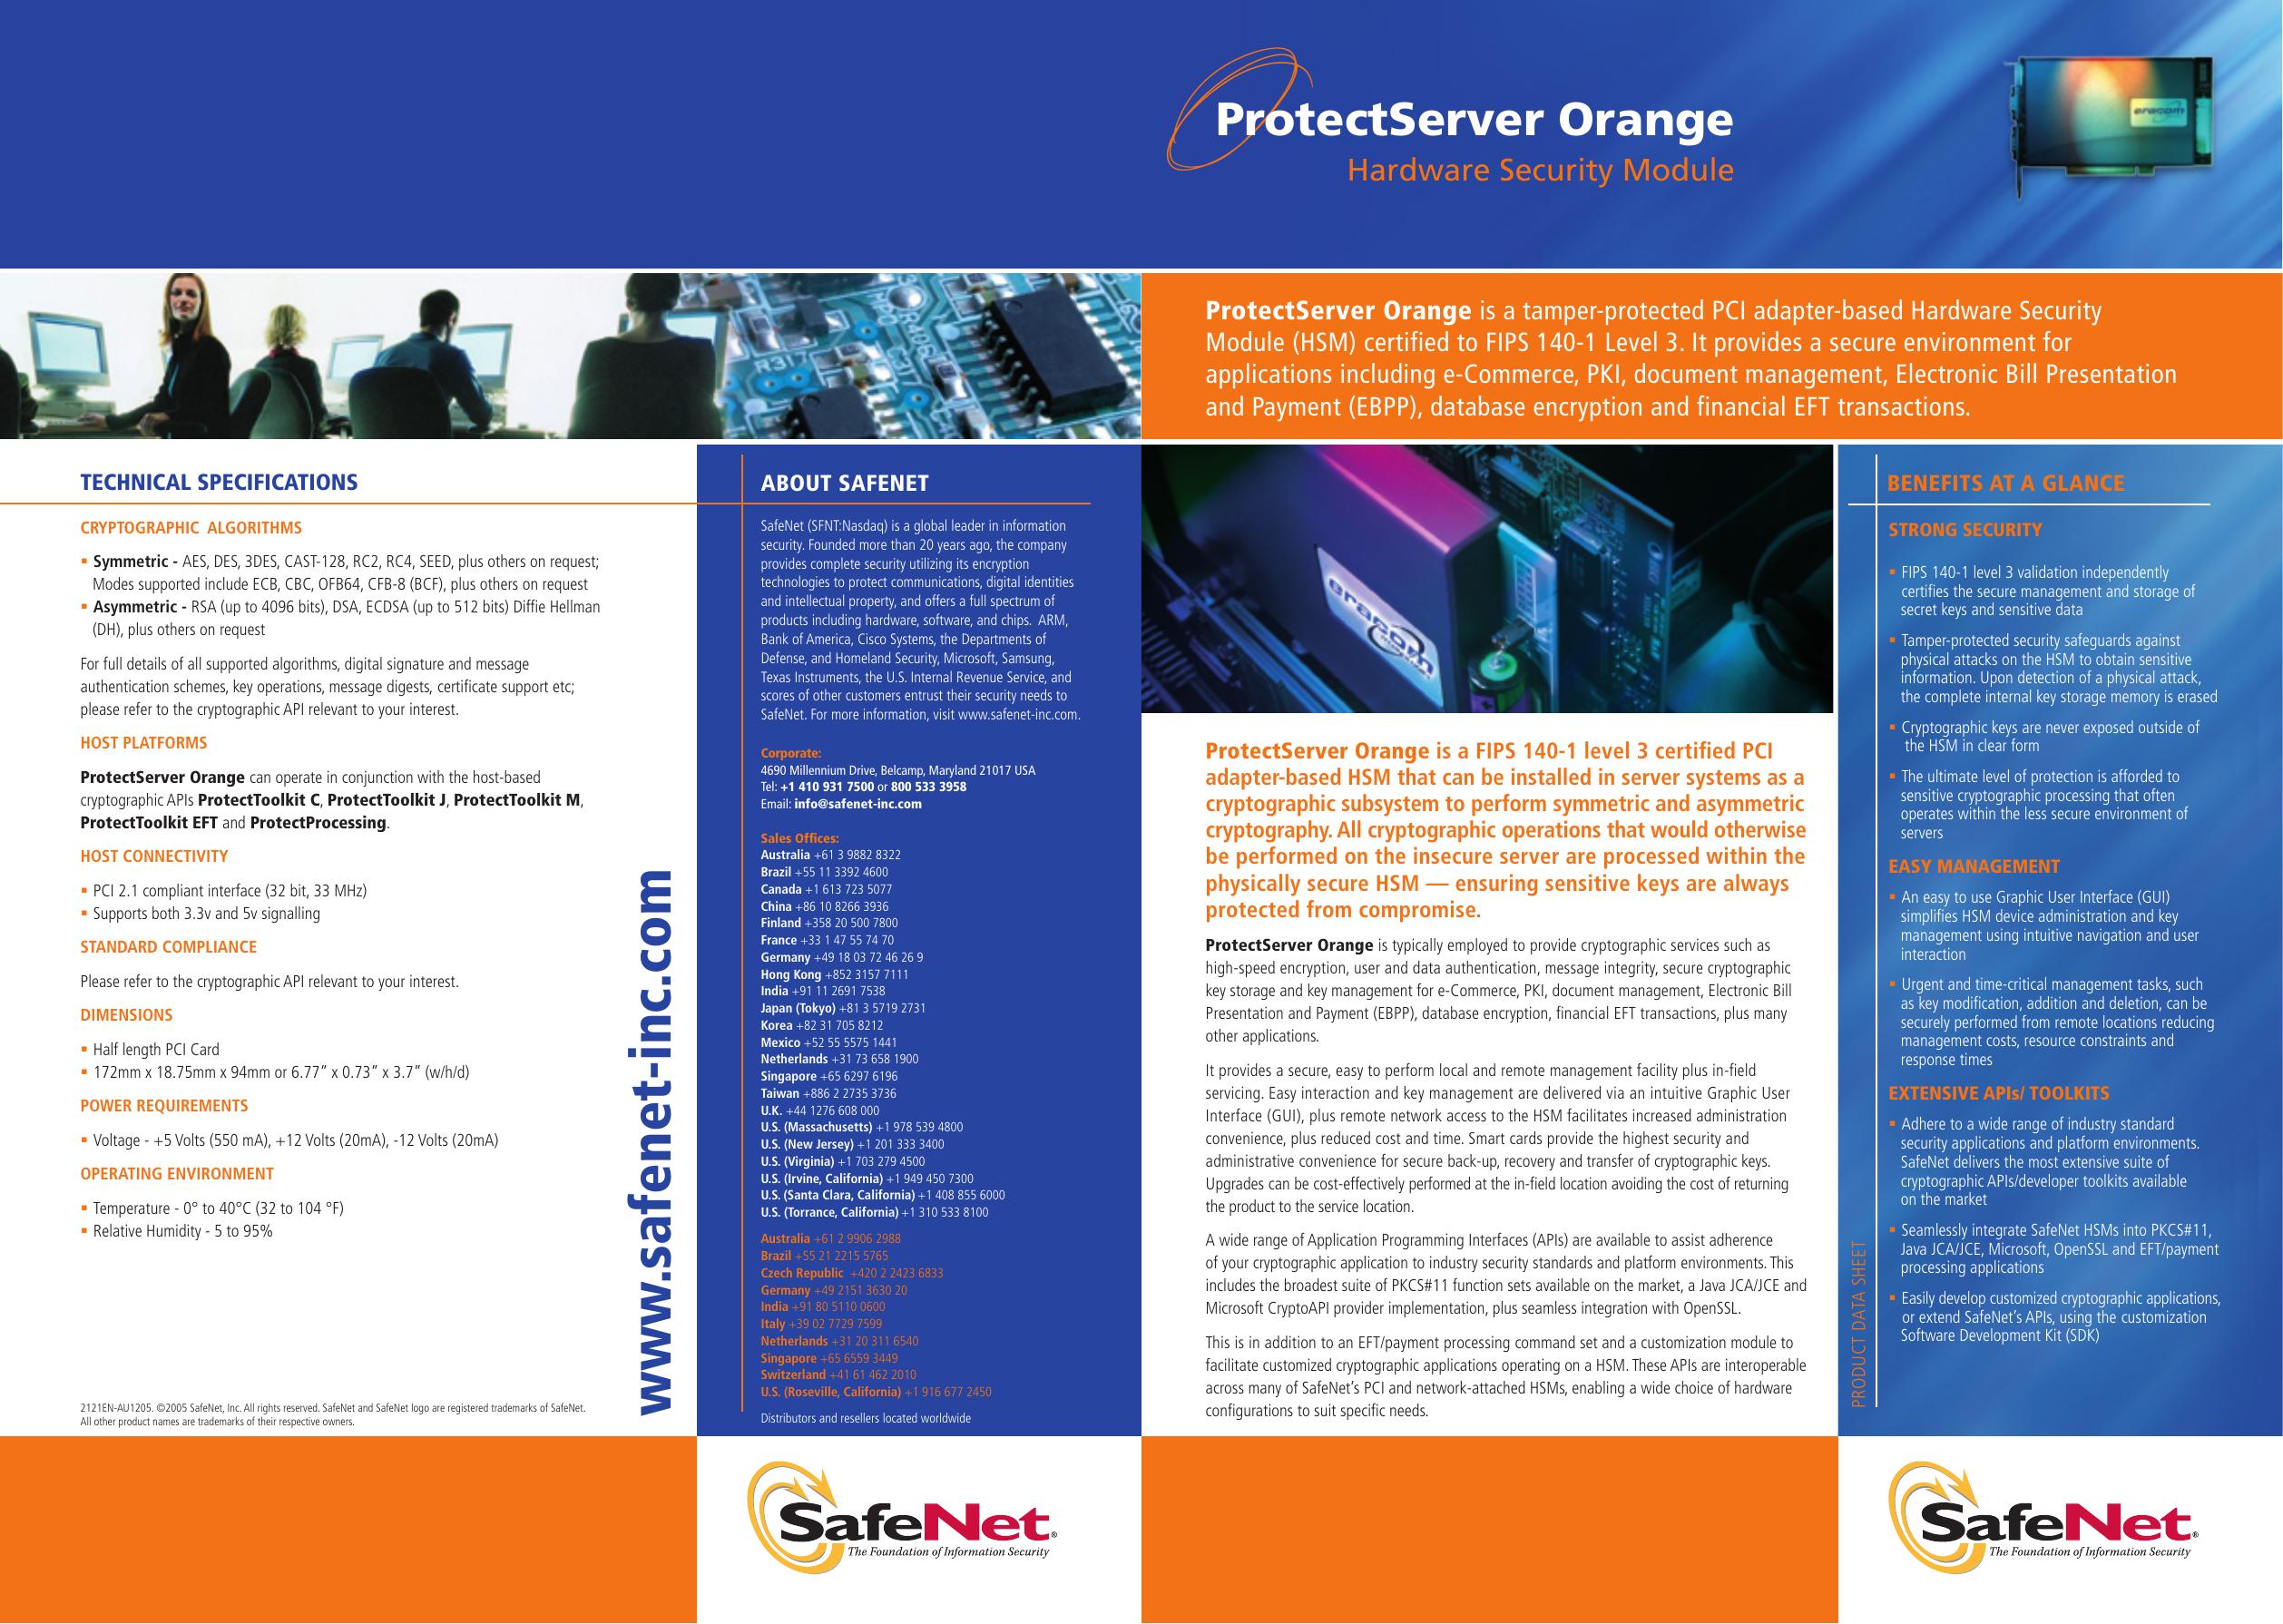 ProtectServer Orange - SafeNet and Gemalto Merger